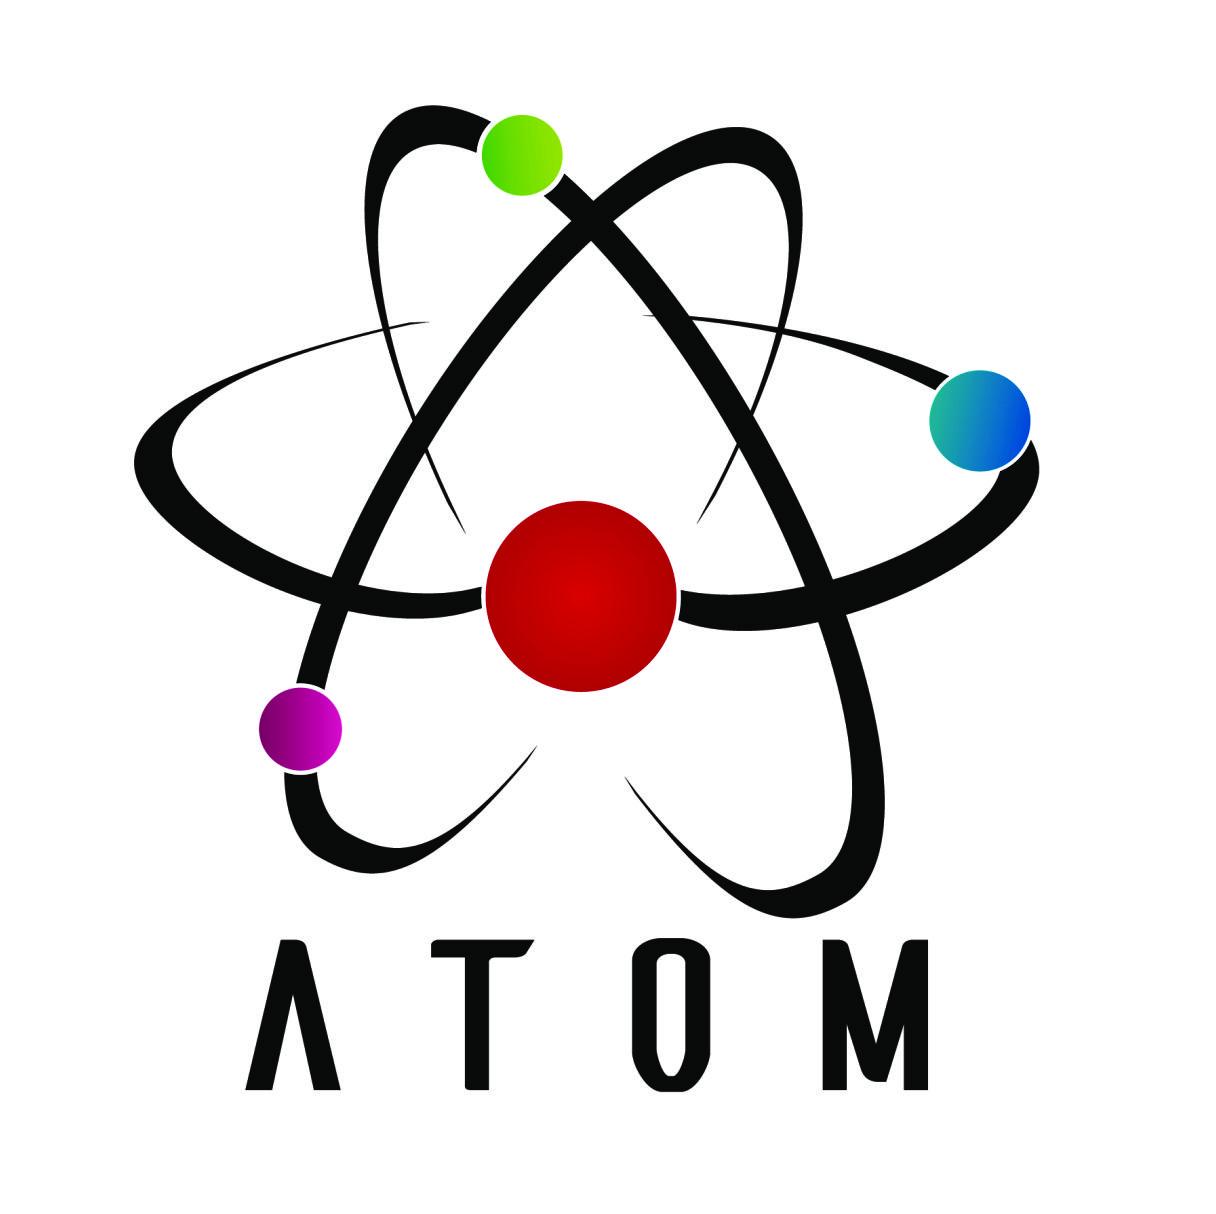 Aikon - Atom